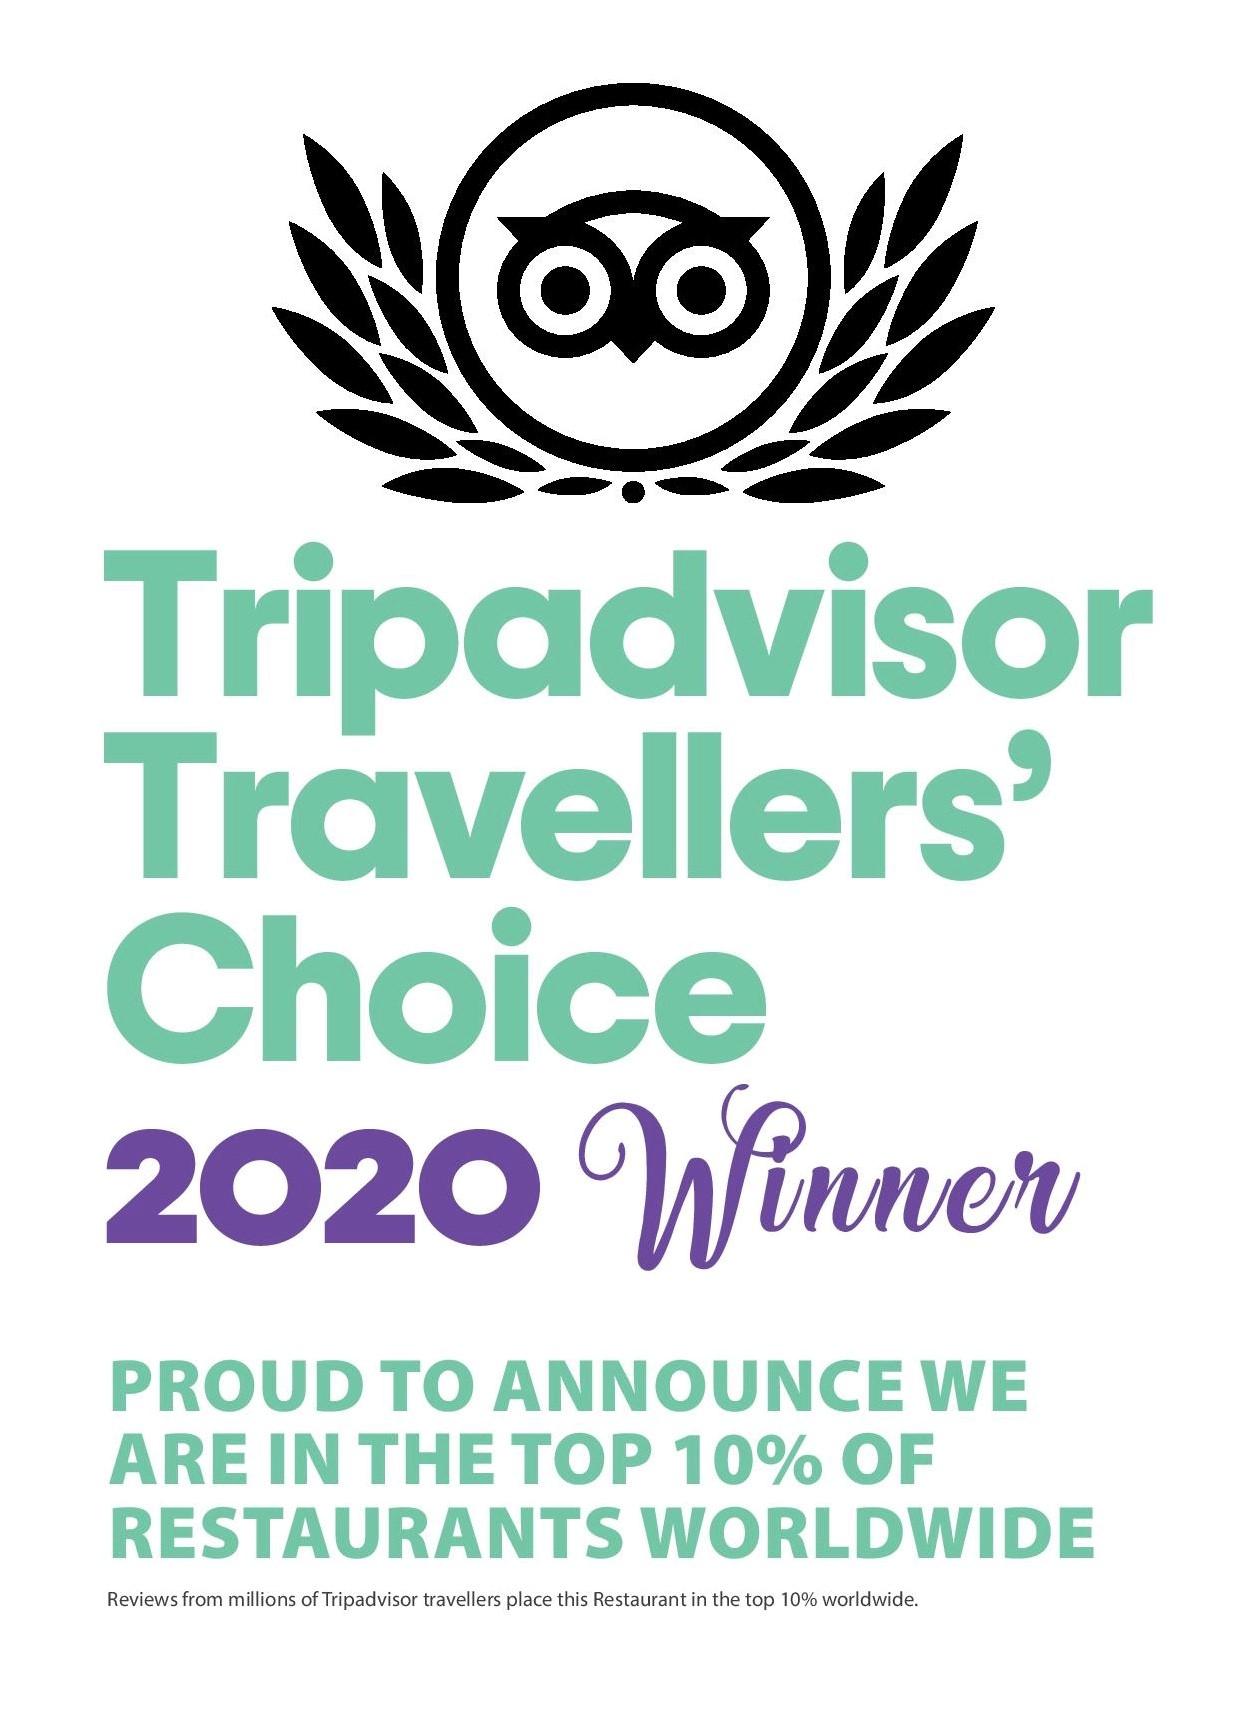 'TRAVELLER'S CHOICE 2020'